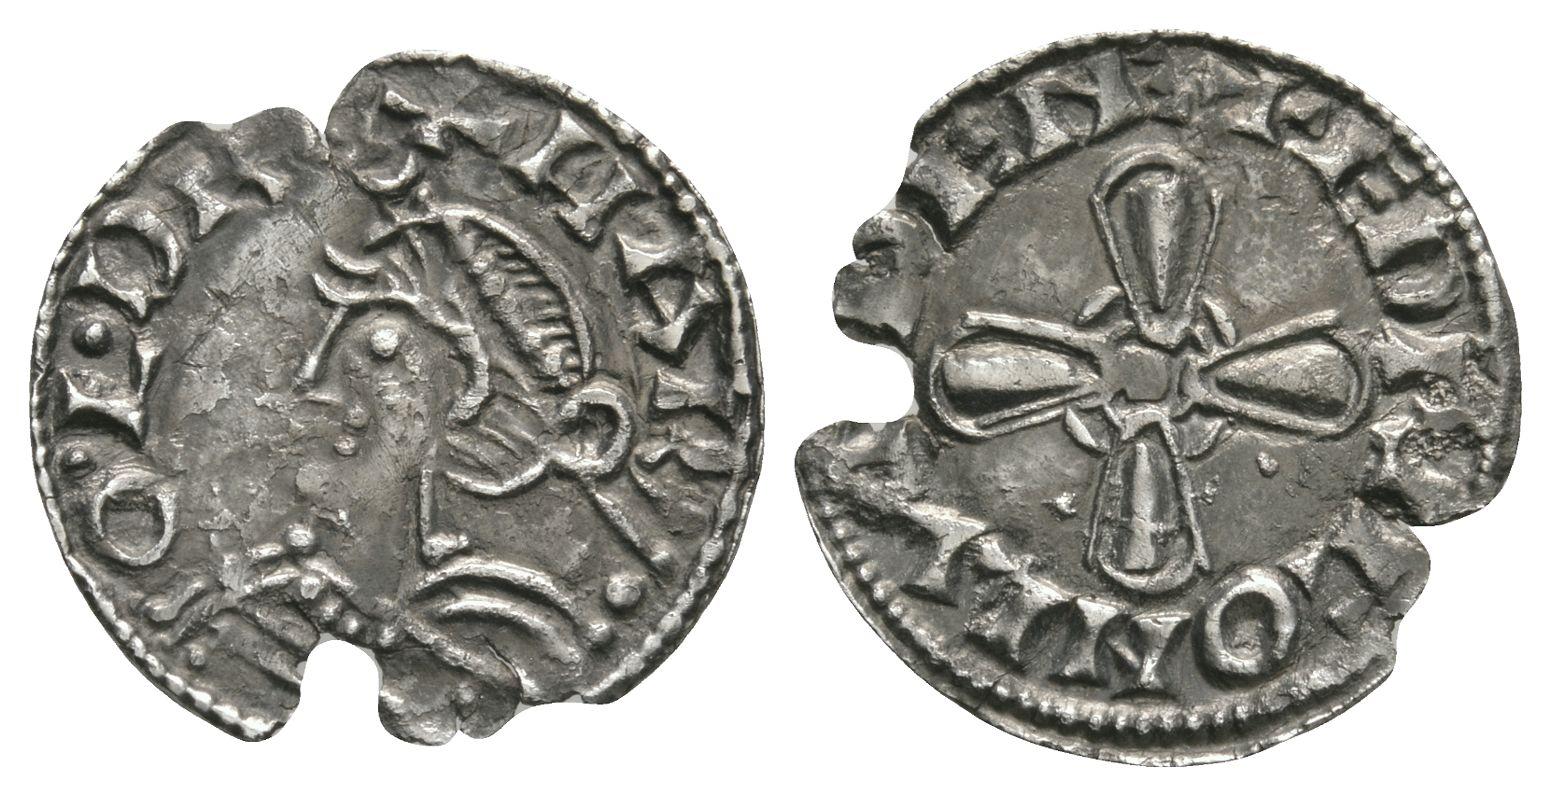 Anglo-Saxon Coins - Harold I - London / Edric - Jewel Cross Penny